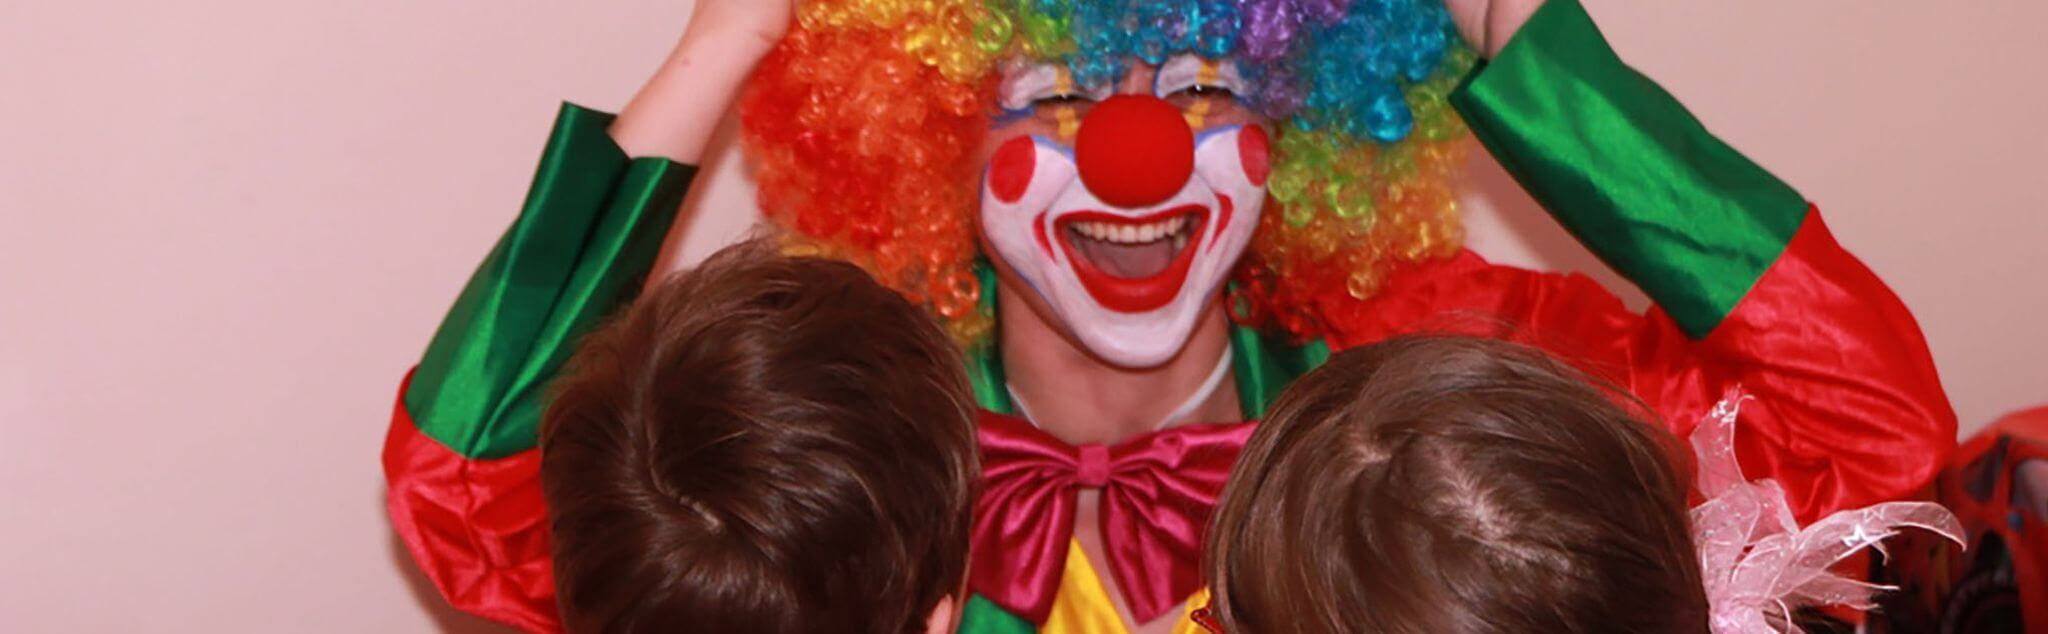 Childrens Parties in Spain